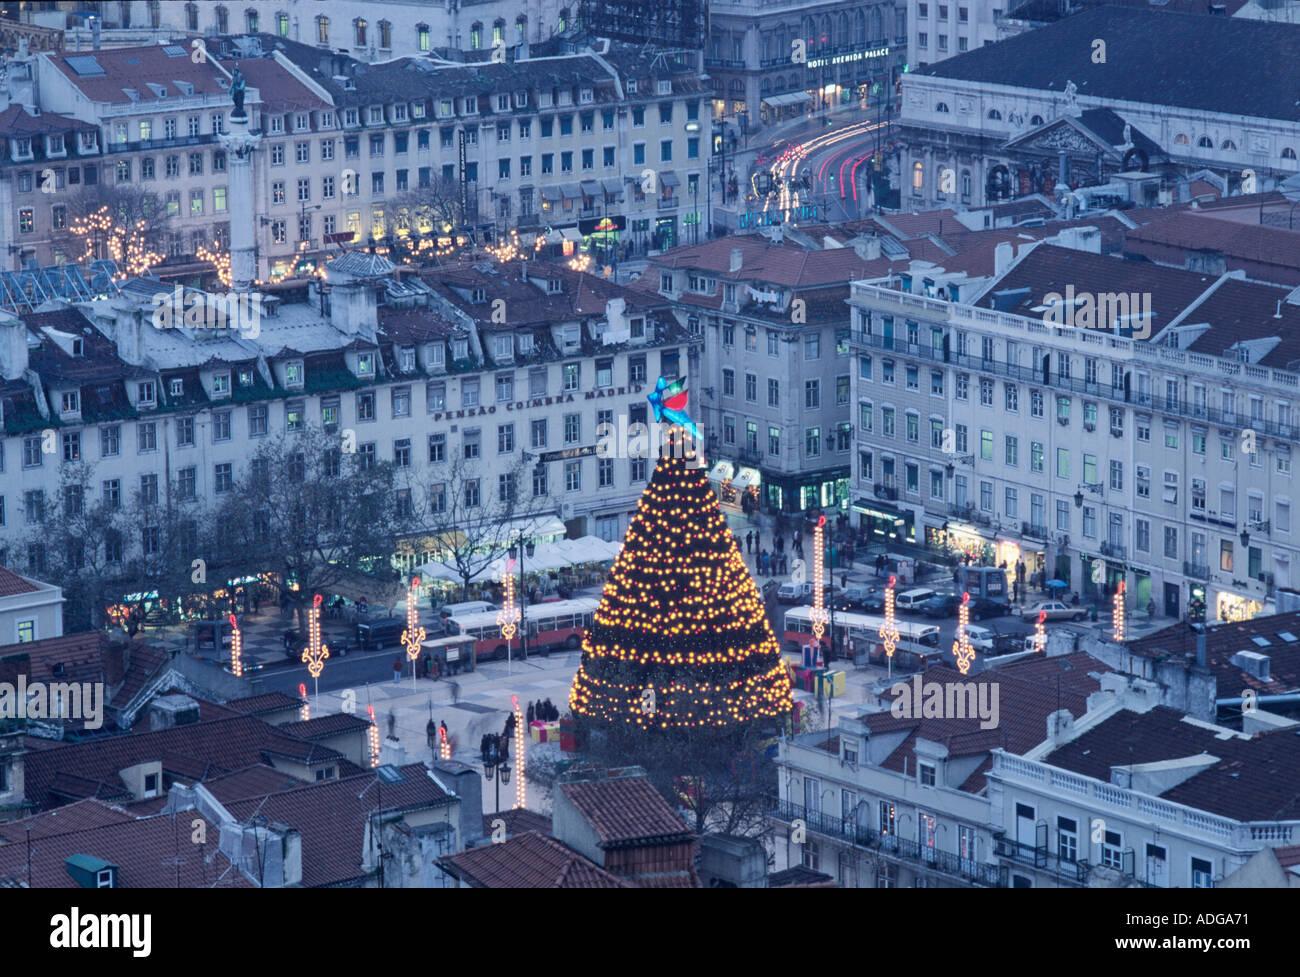 Christmas In Portugal.Praca Da Figueira At Christmas Lisbon Portugal Stock Photo